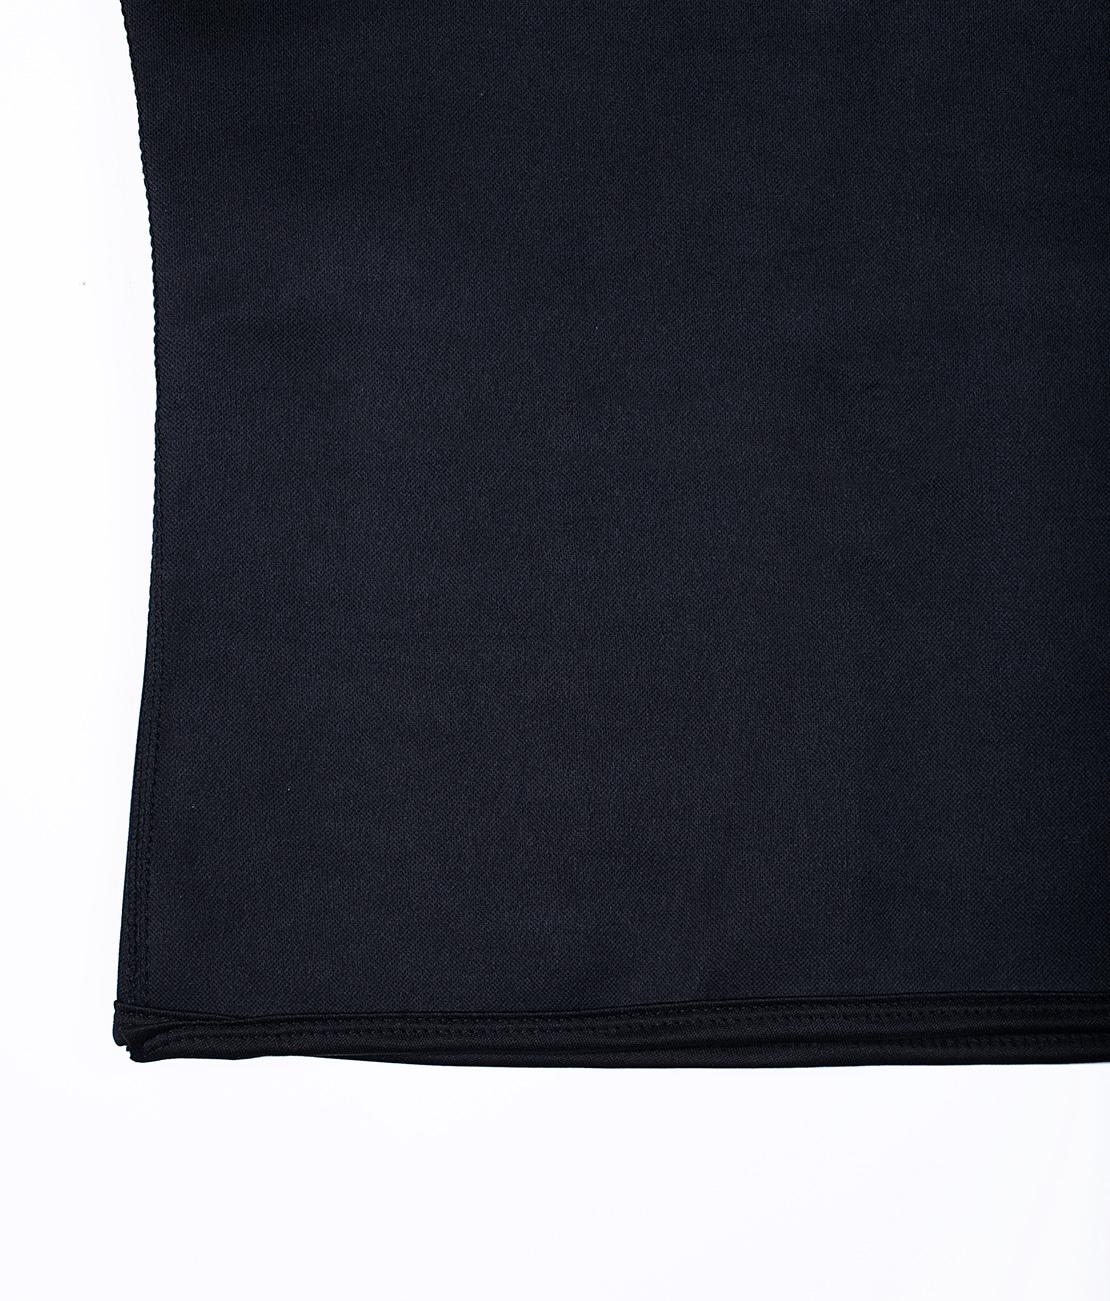 T-Shirt de sudation Noir Packshot Detail 2